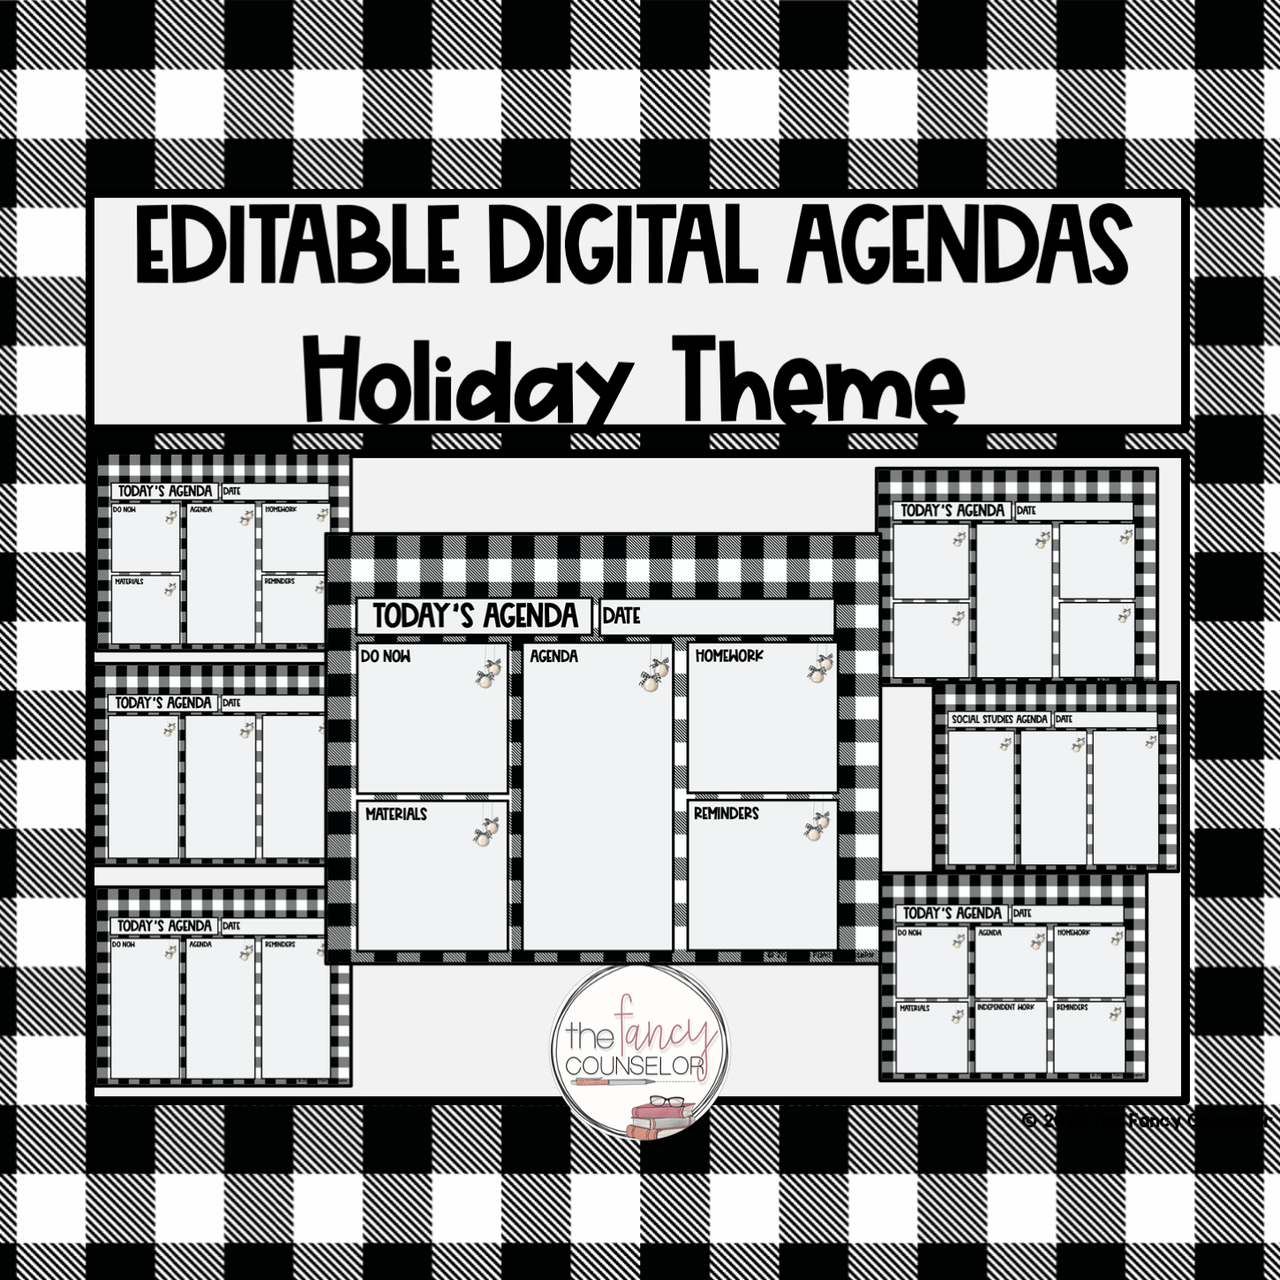 Editable Digital Daily Agendas Christmas Holiday Theme